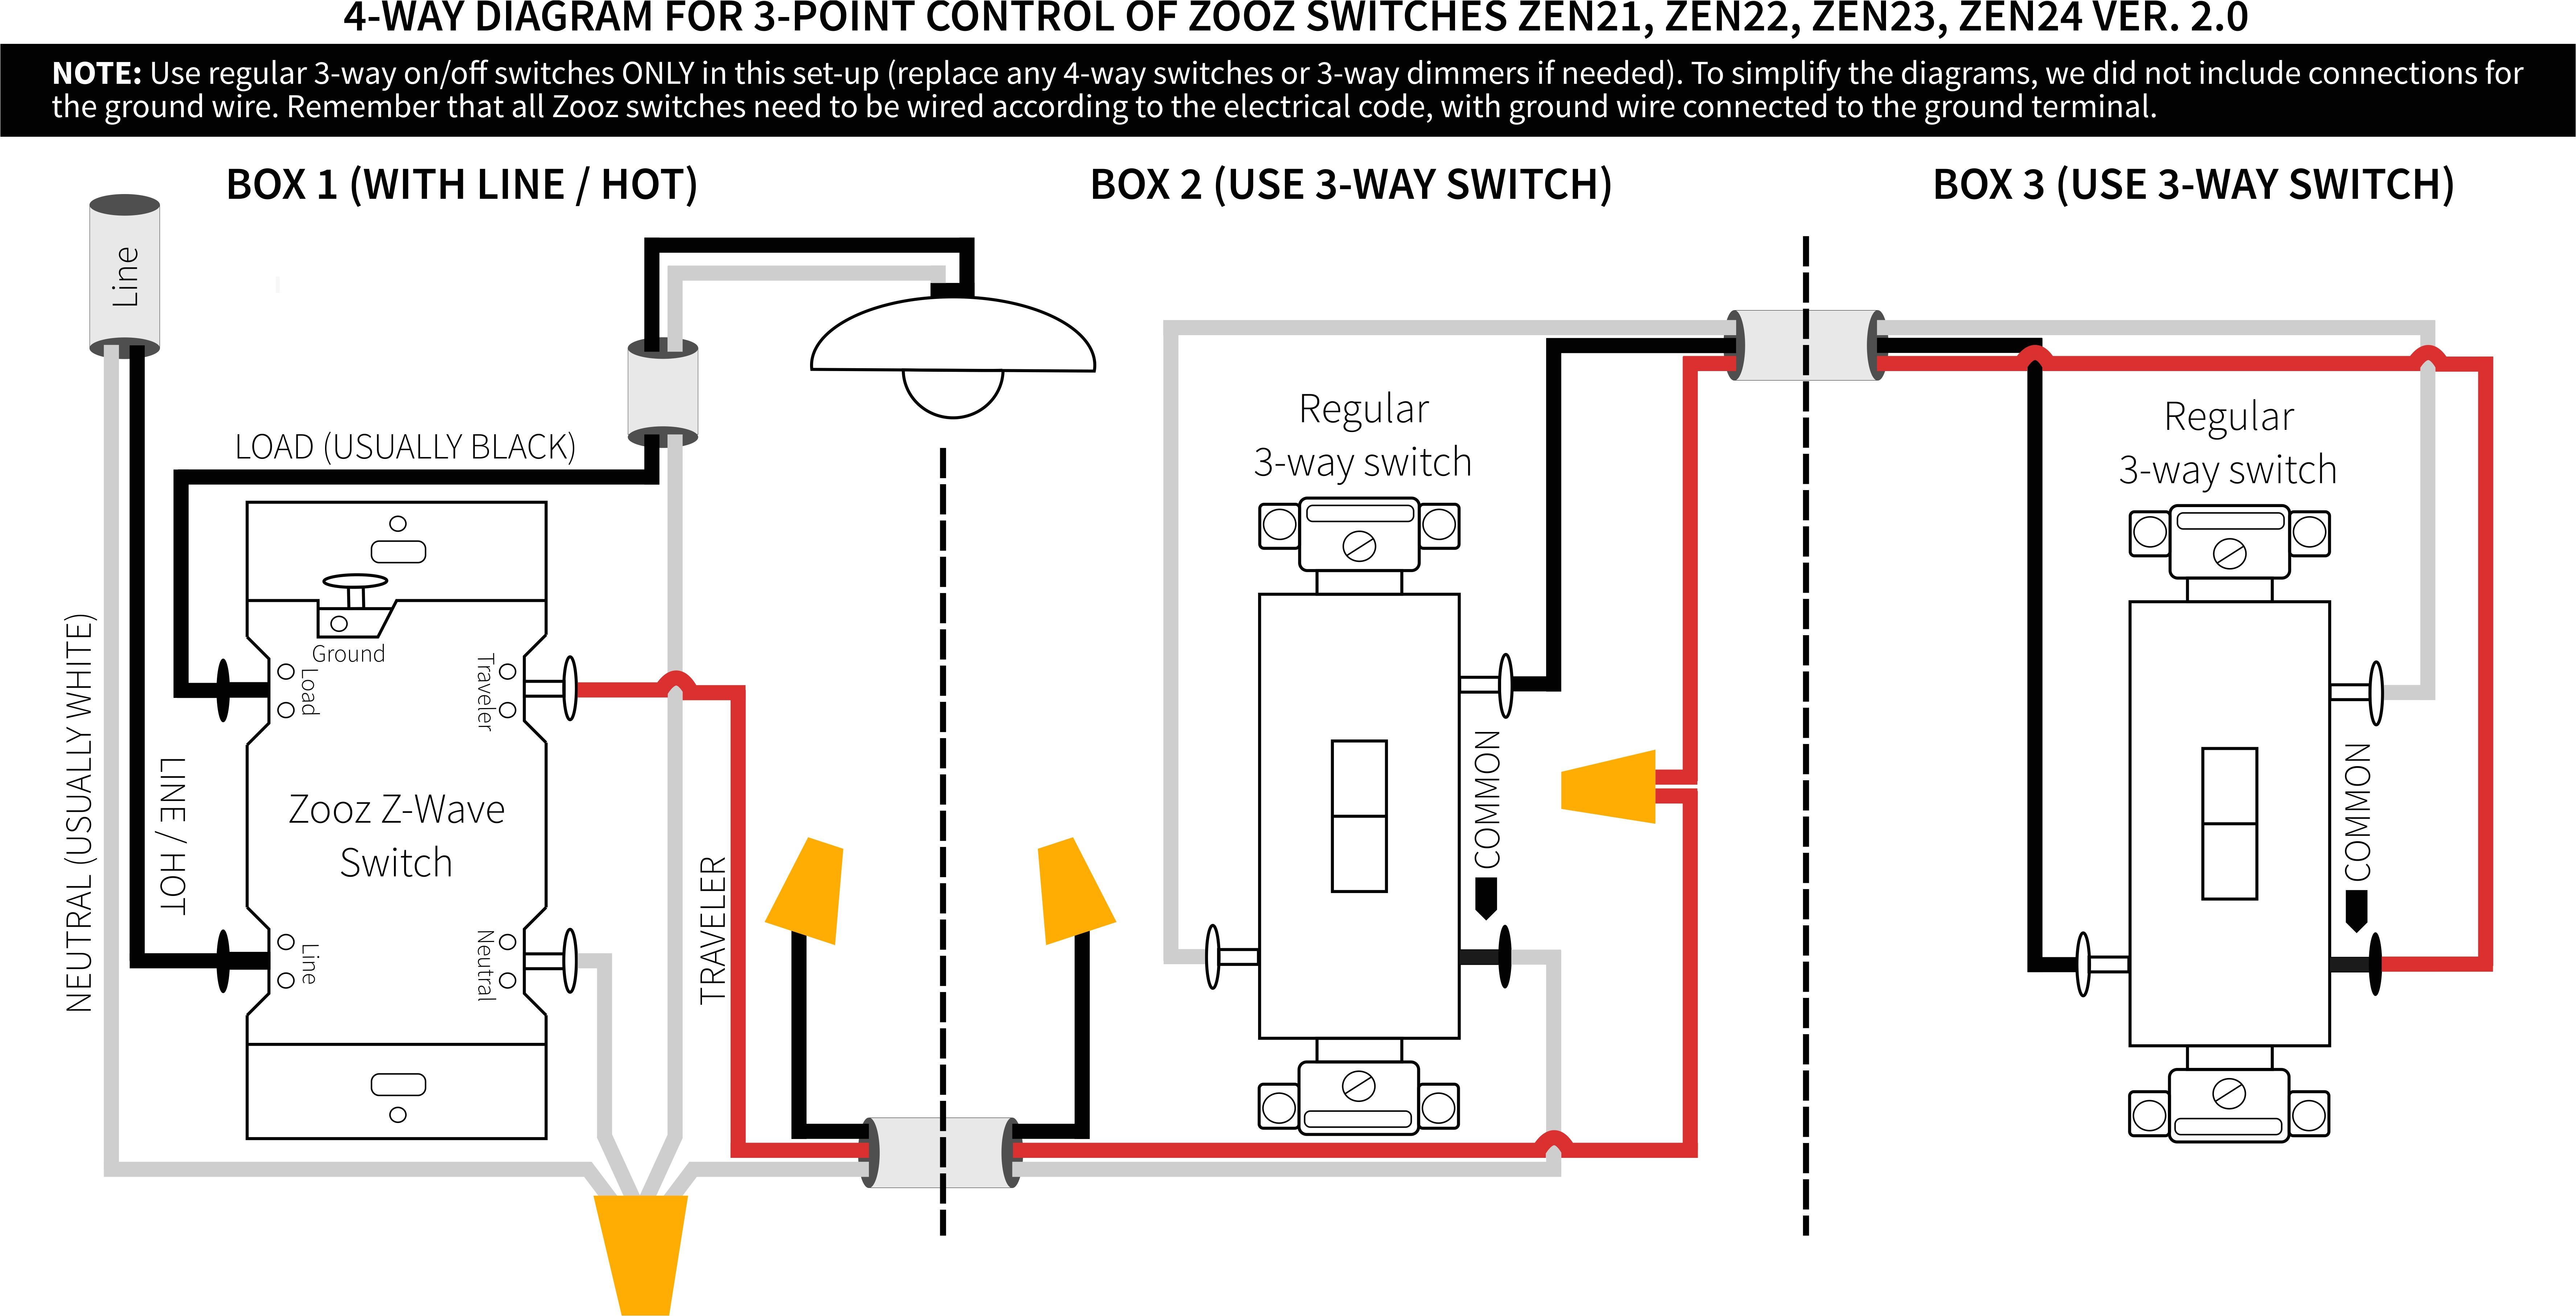 Wiring Diagram for 2 3 Way Switches Iris 3 Way Switch Wiring Wiring Diagram Show